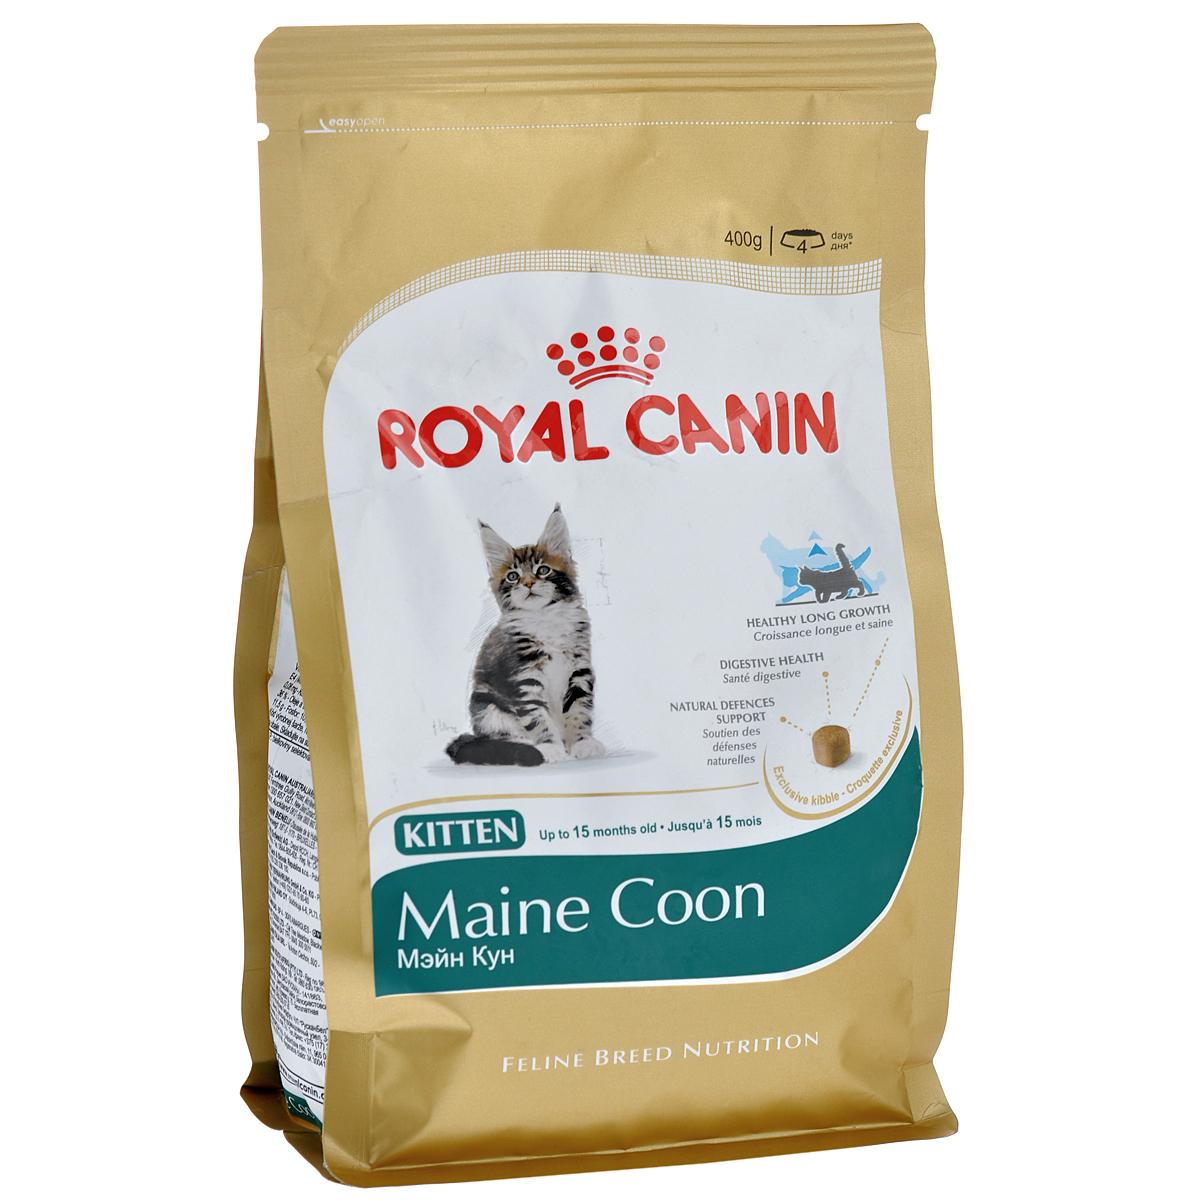 Корм сухой Royal Canin Maine Coon Kitten, для котят породы мейн-кун в возрасте от 3 до 15 месяцев, 400 г корм для кошек взрослых породы мейн кун соус 12х0 085 кг